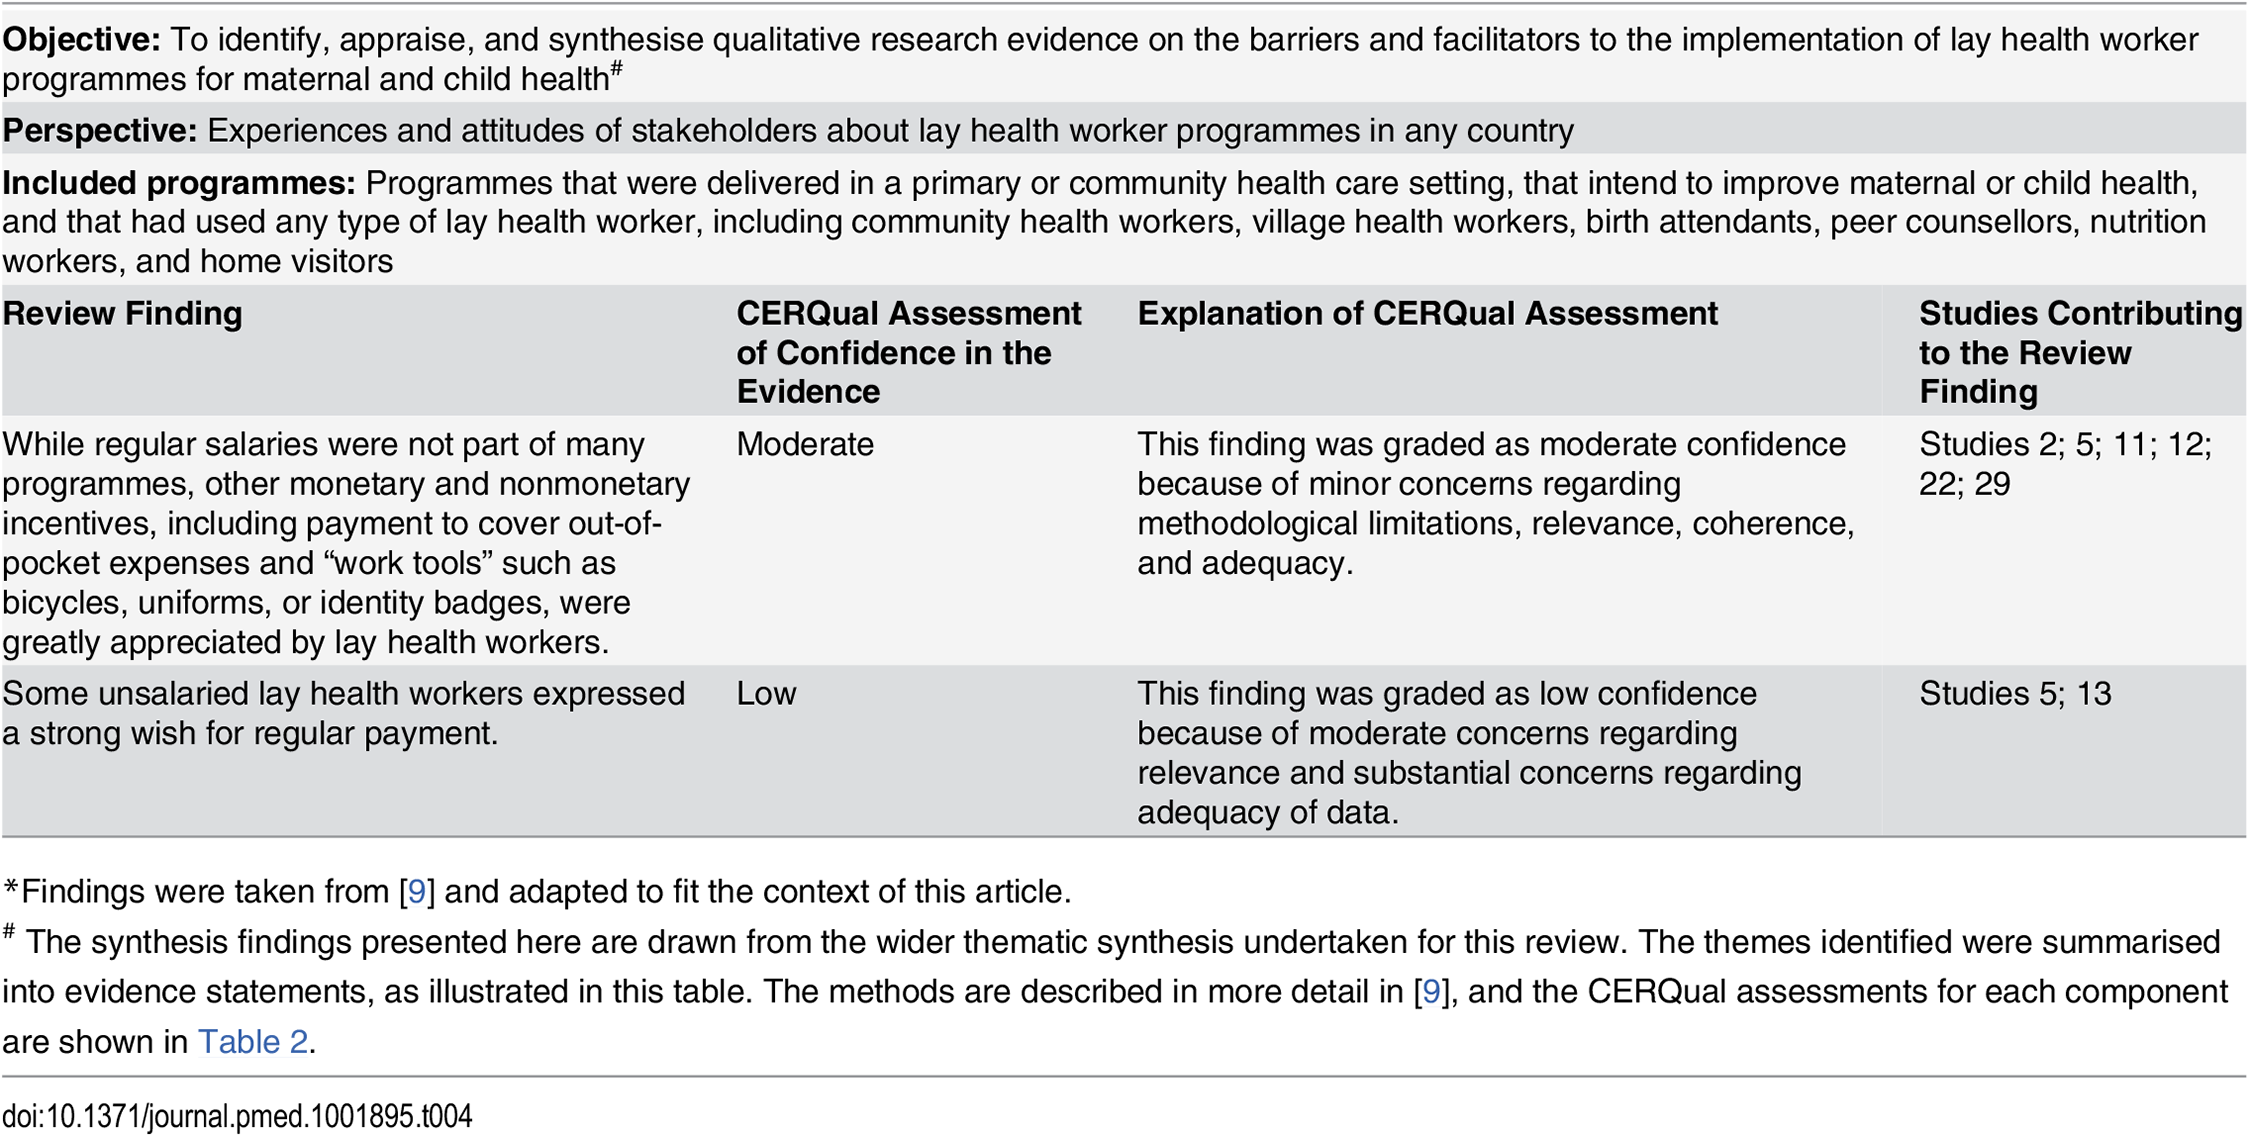 Example of a CERQual Summary of Qualitative Findings table<em class=&quot;ref&quot;>*</em><em class=&quot;ref&quot;><sup>#</sup></em>.